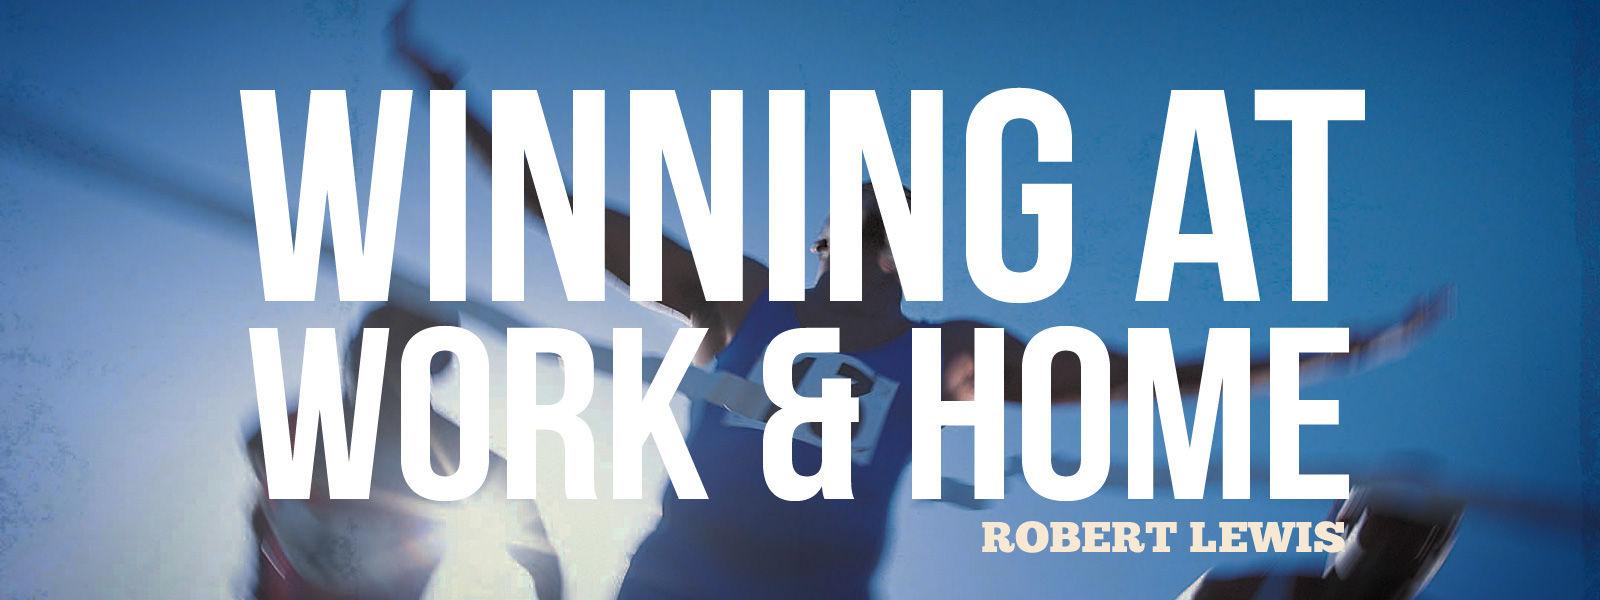 Winning at Work & Home